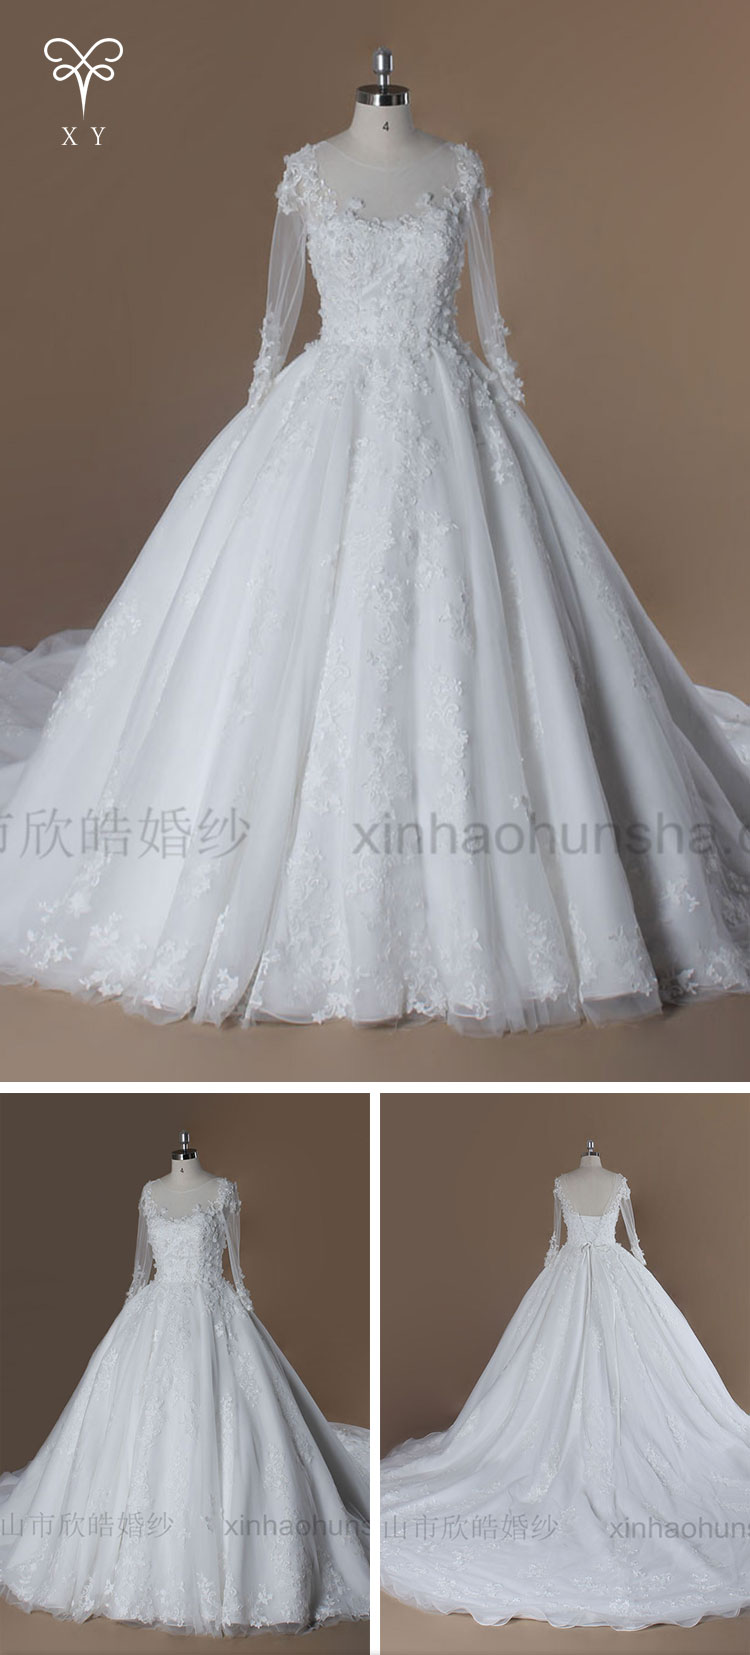 2017 Wedding Dress Patterns Wedding Dress Ball Gown - Buy Sweetheart ...